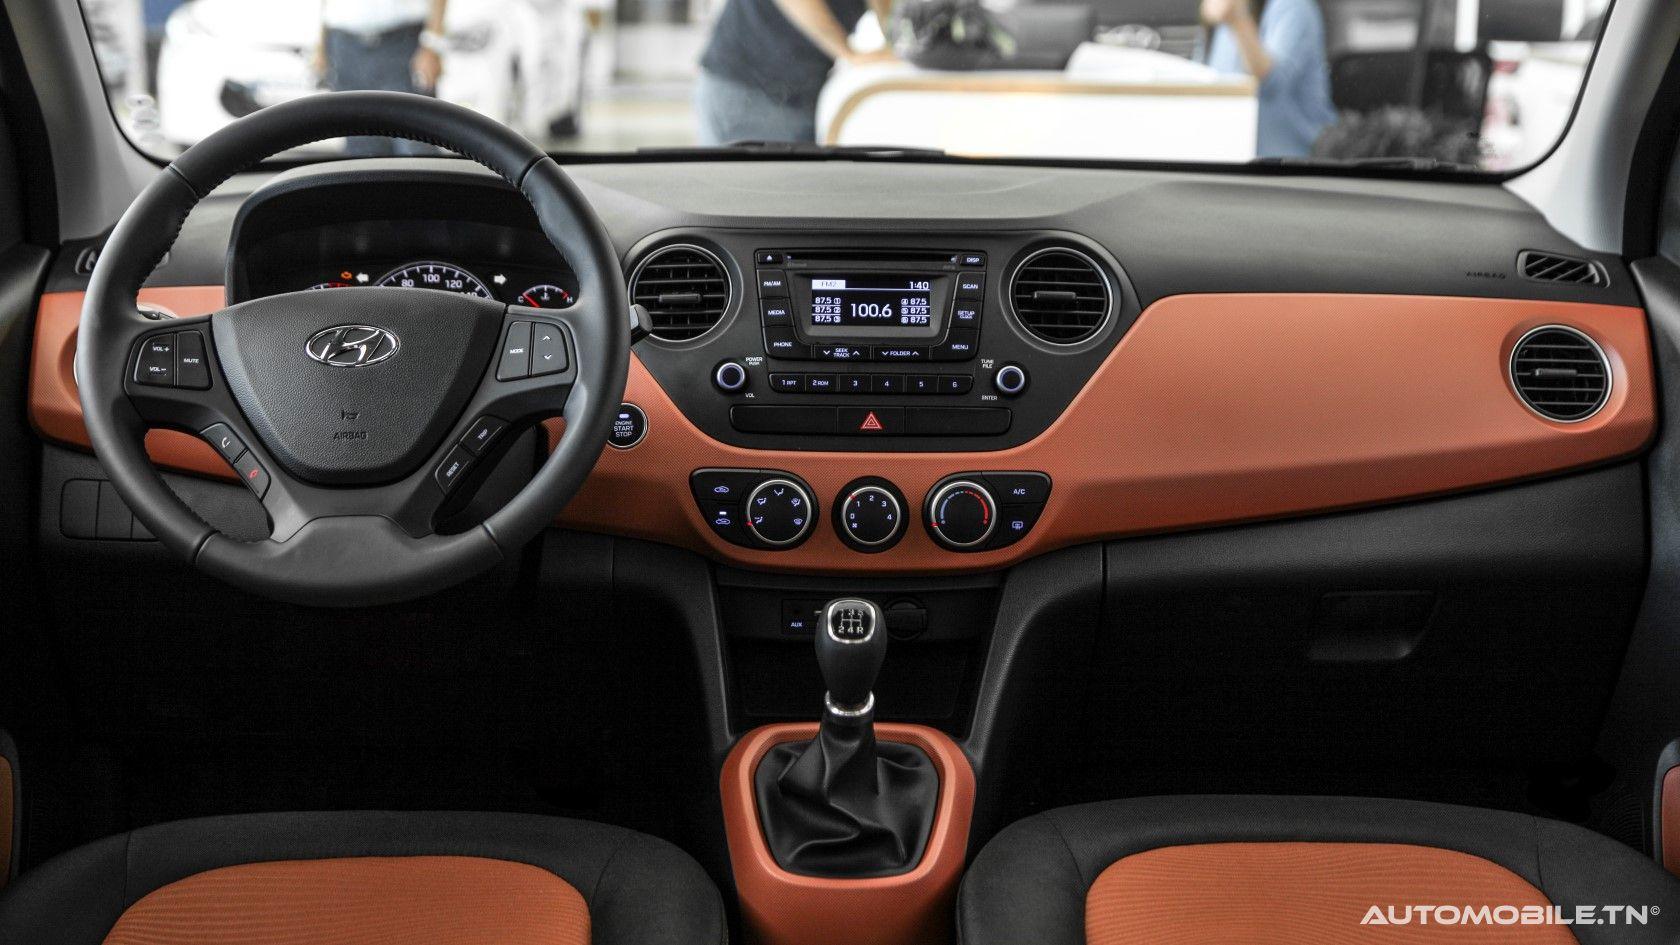 Actu - Hyundai Grand i10 restylé chez Alpha Hyundai Motors